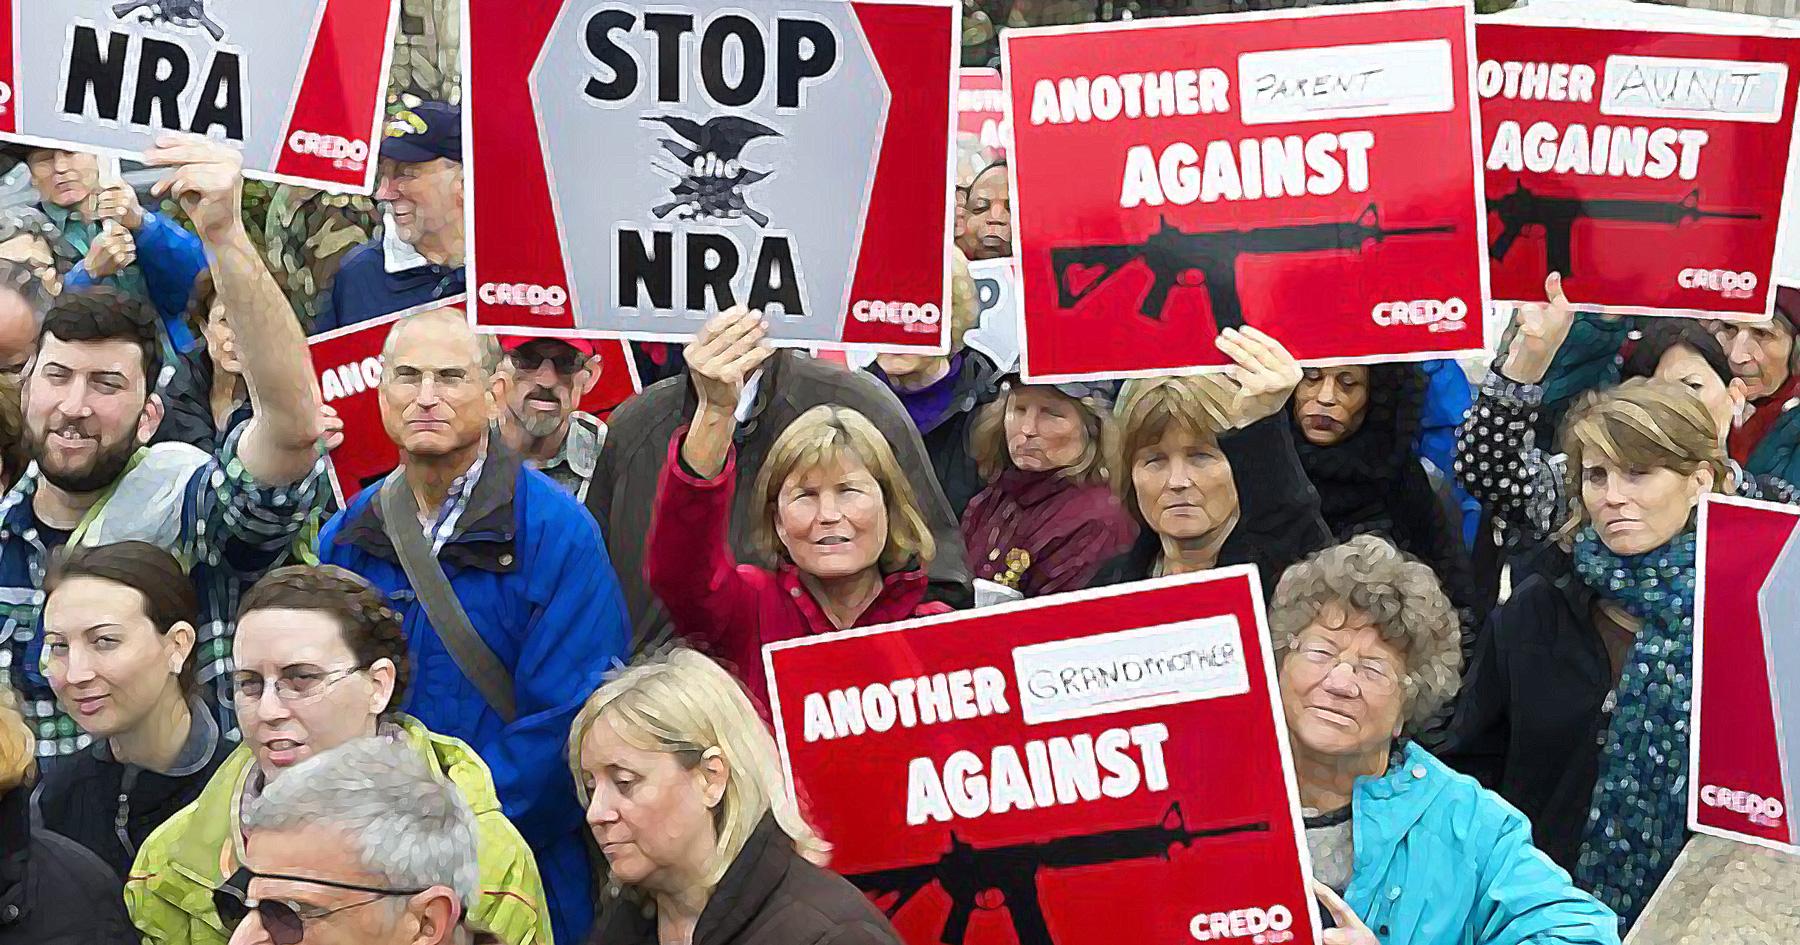 guns, anti-gun, second amendment, Common Sense, illustration